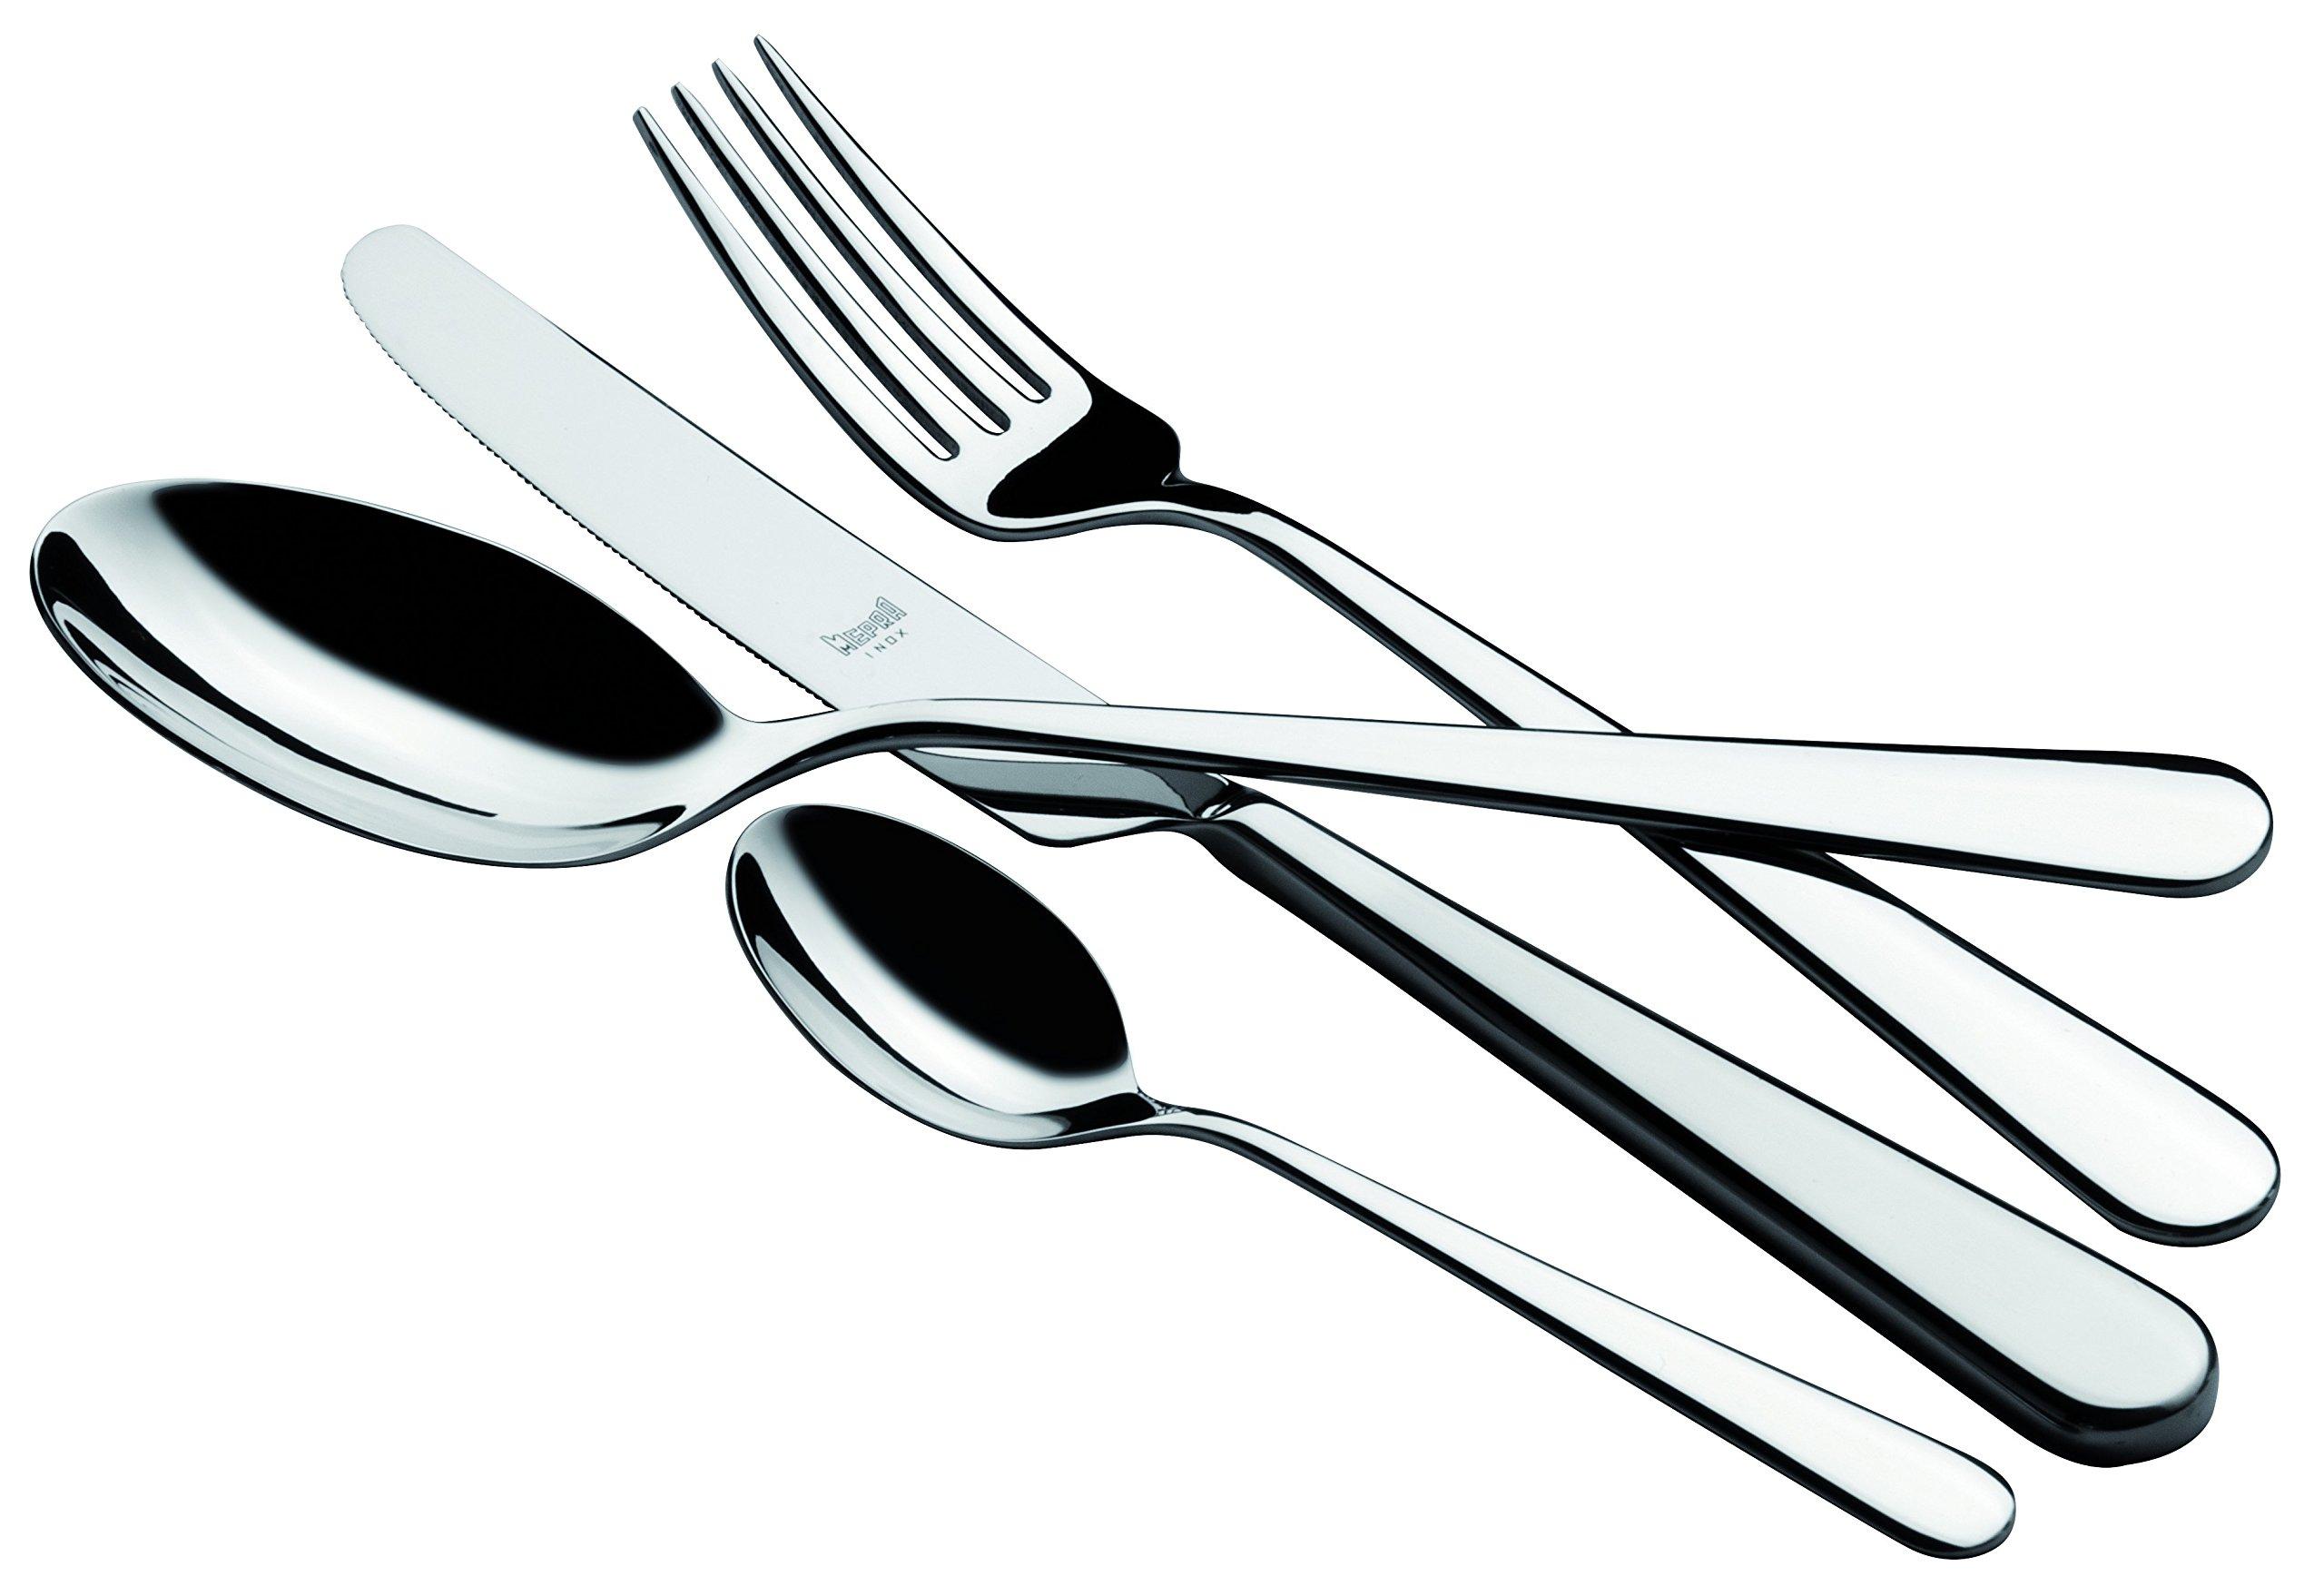 Mepra 107122024 24 Piece Stoccolma Cutlery Set, Stainless Steel by MEPRA